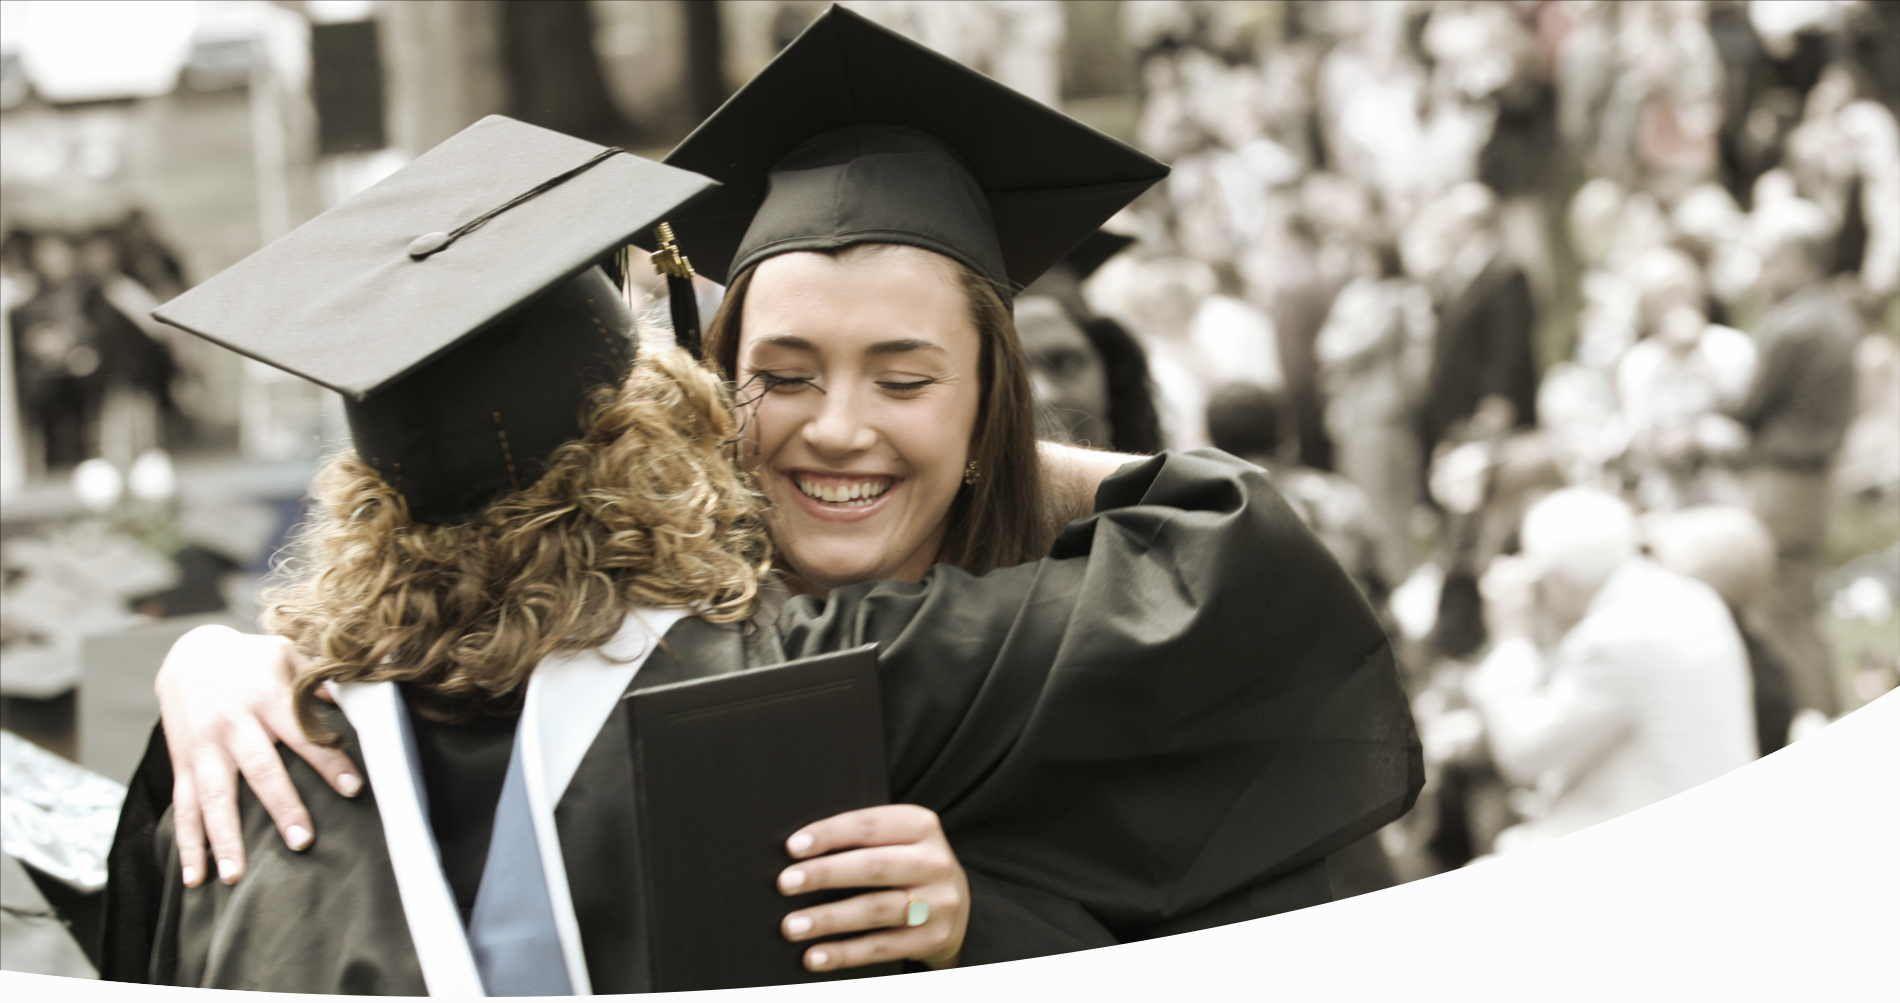 17 Best images about Graduación Ropa y Accesorios on Pinterest | A ...